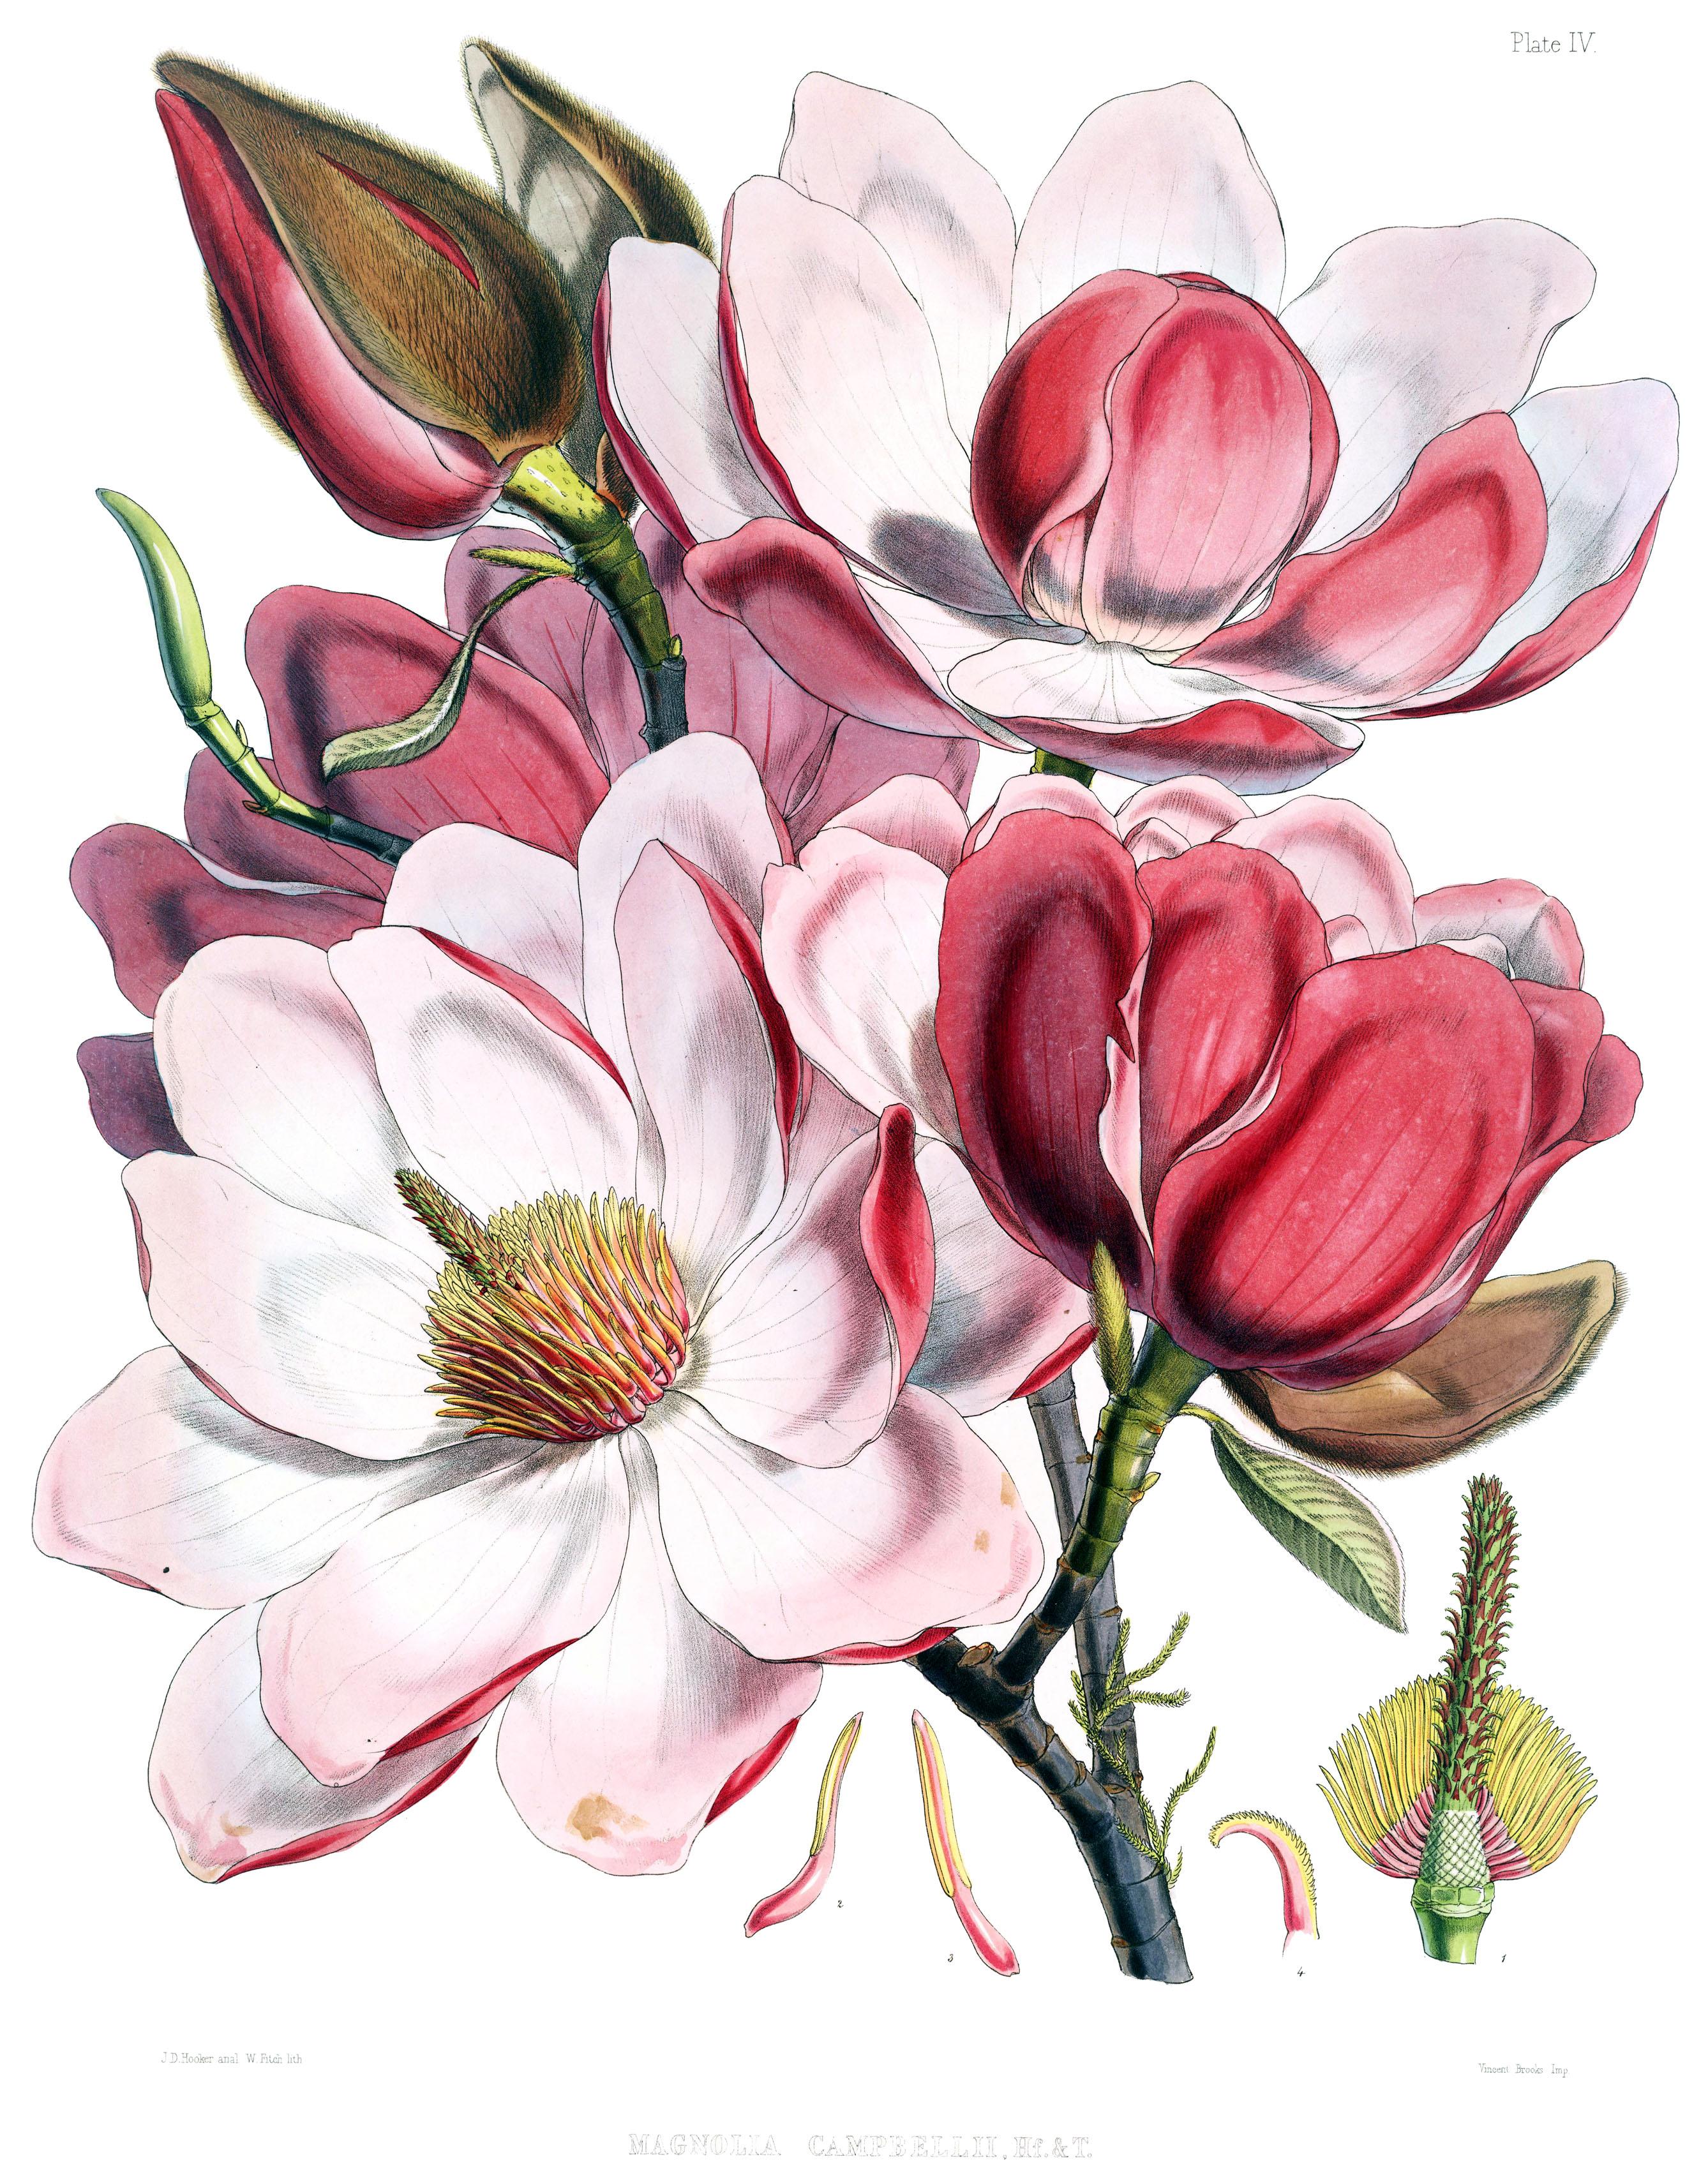 2676x3416 Filemagnolia Campbellii Flowers.jpg